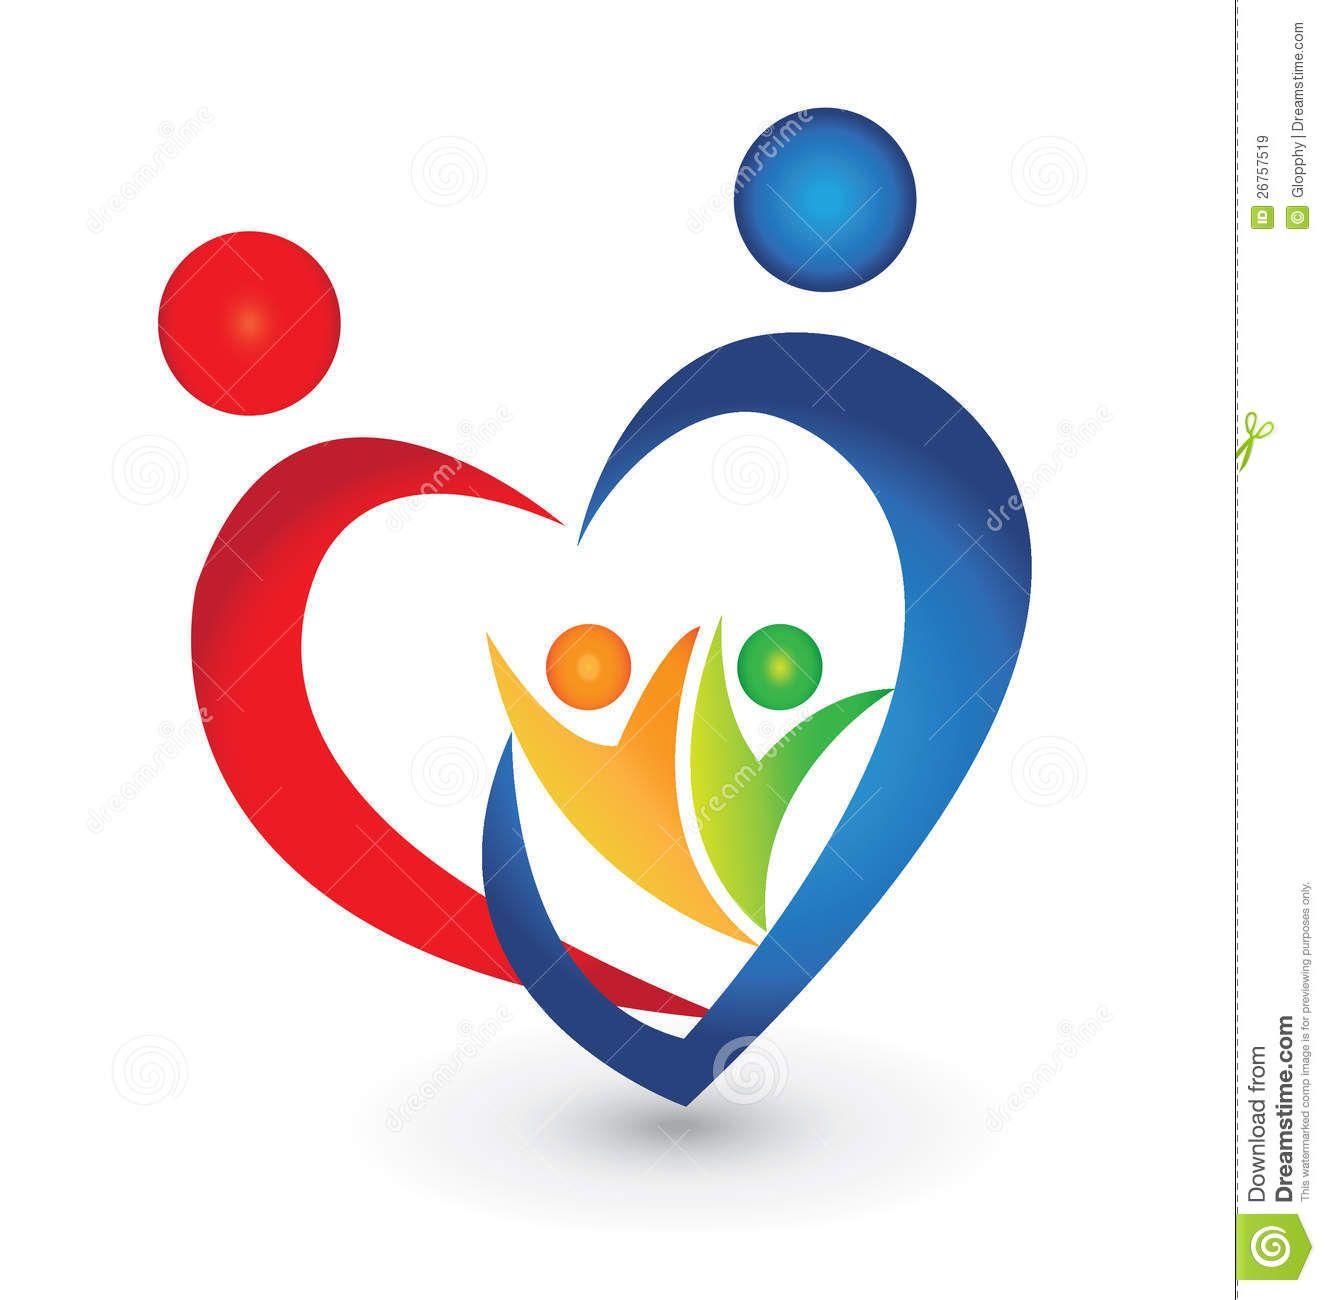 Family Union In A Heart Shape Logo Royalty Free Stock